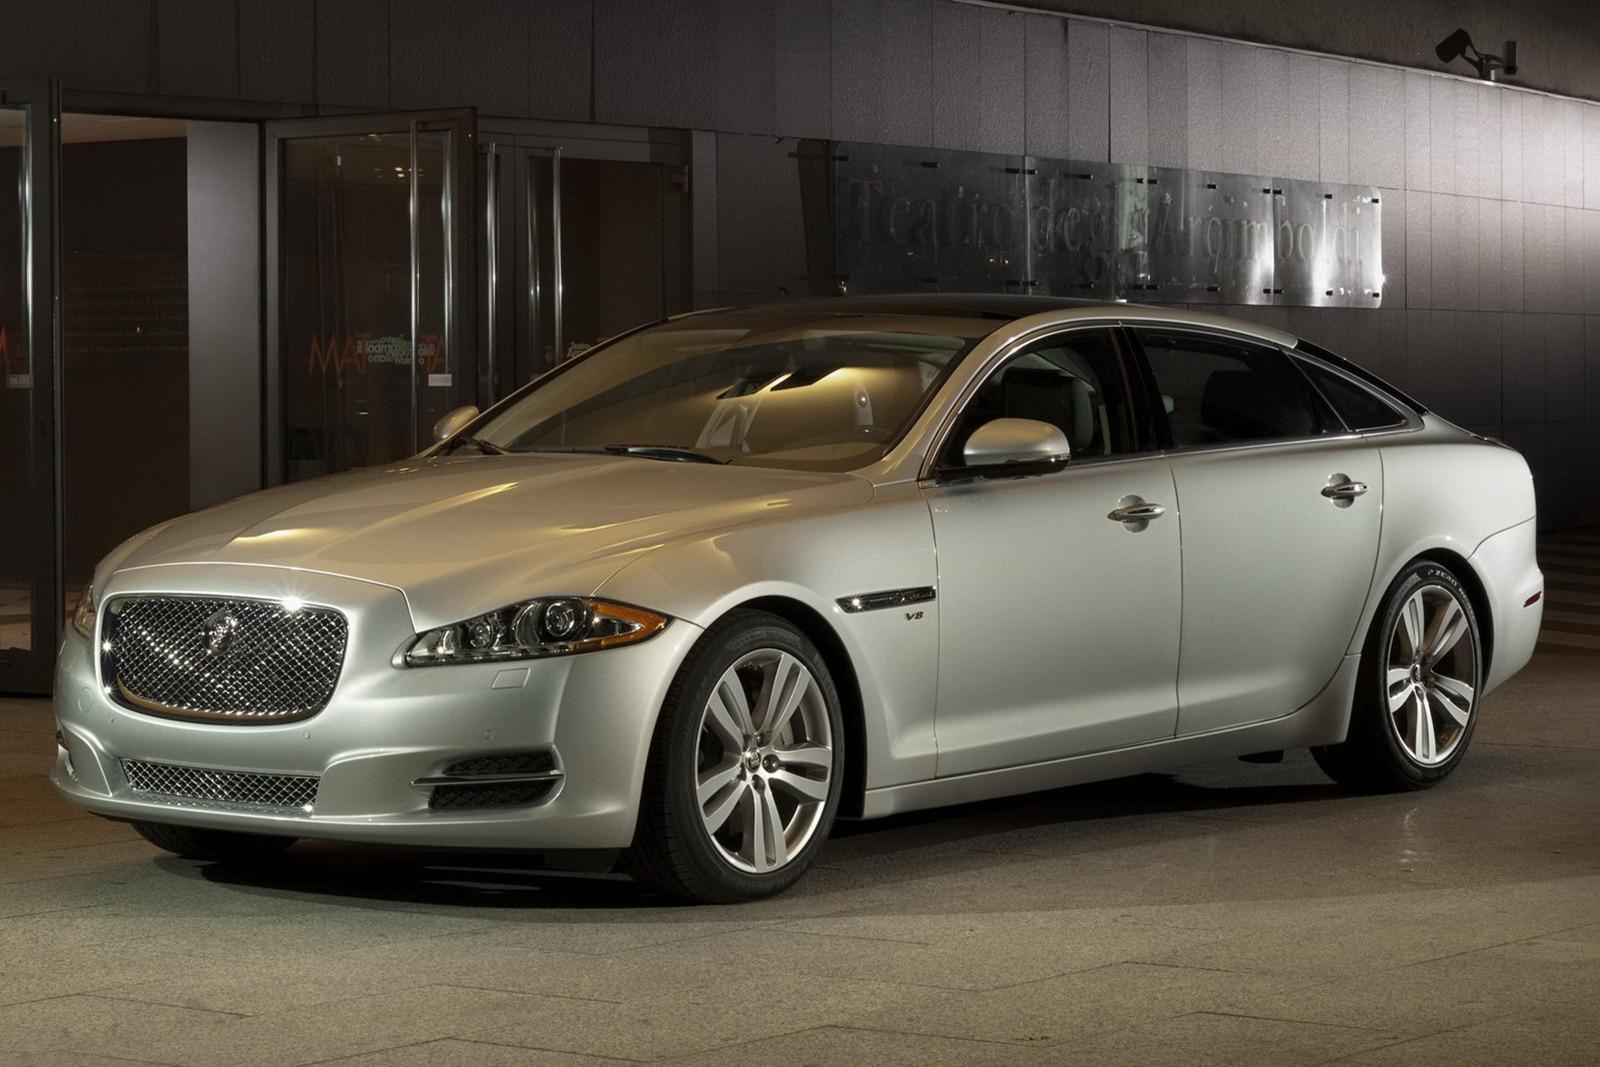 Jaguar XJ Model Year 2013